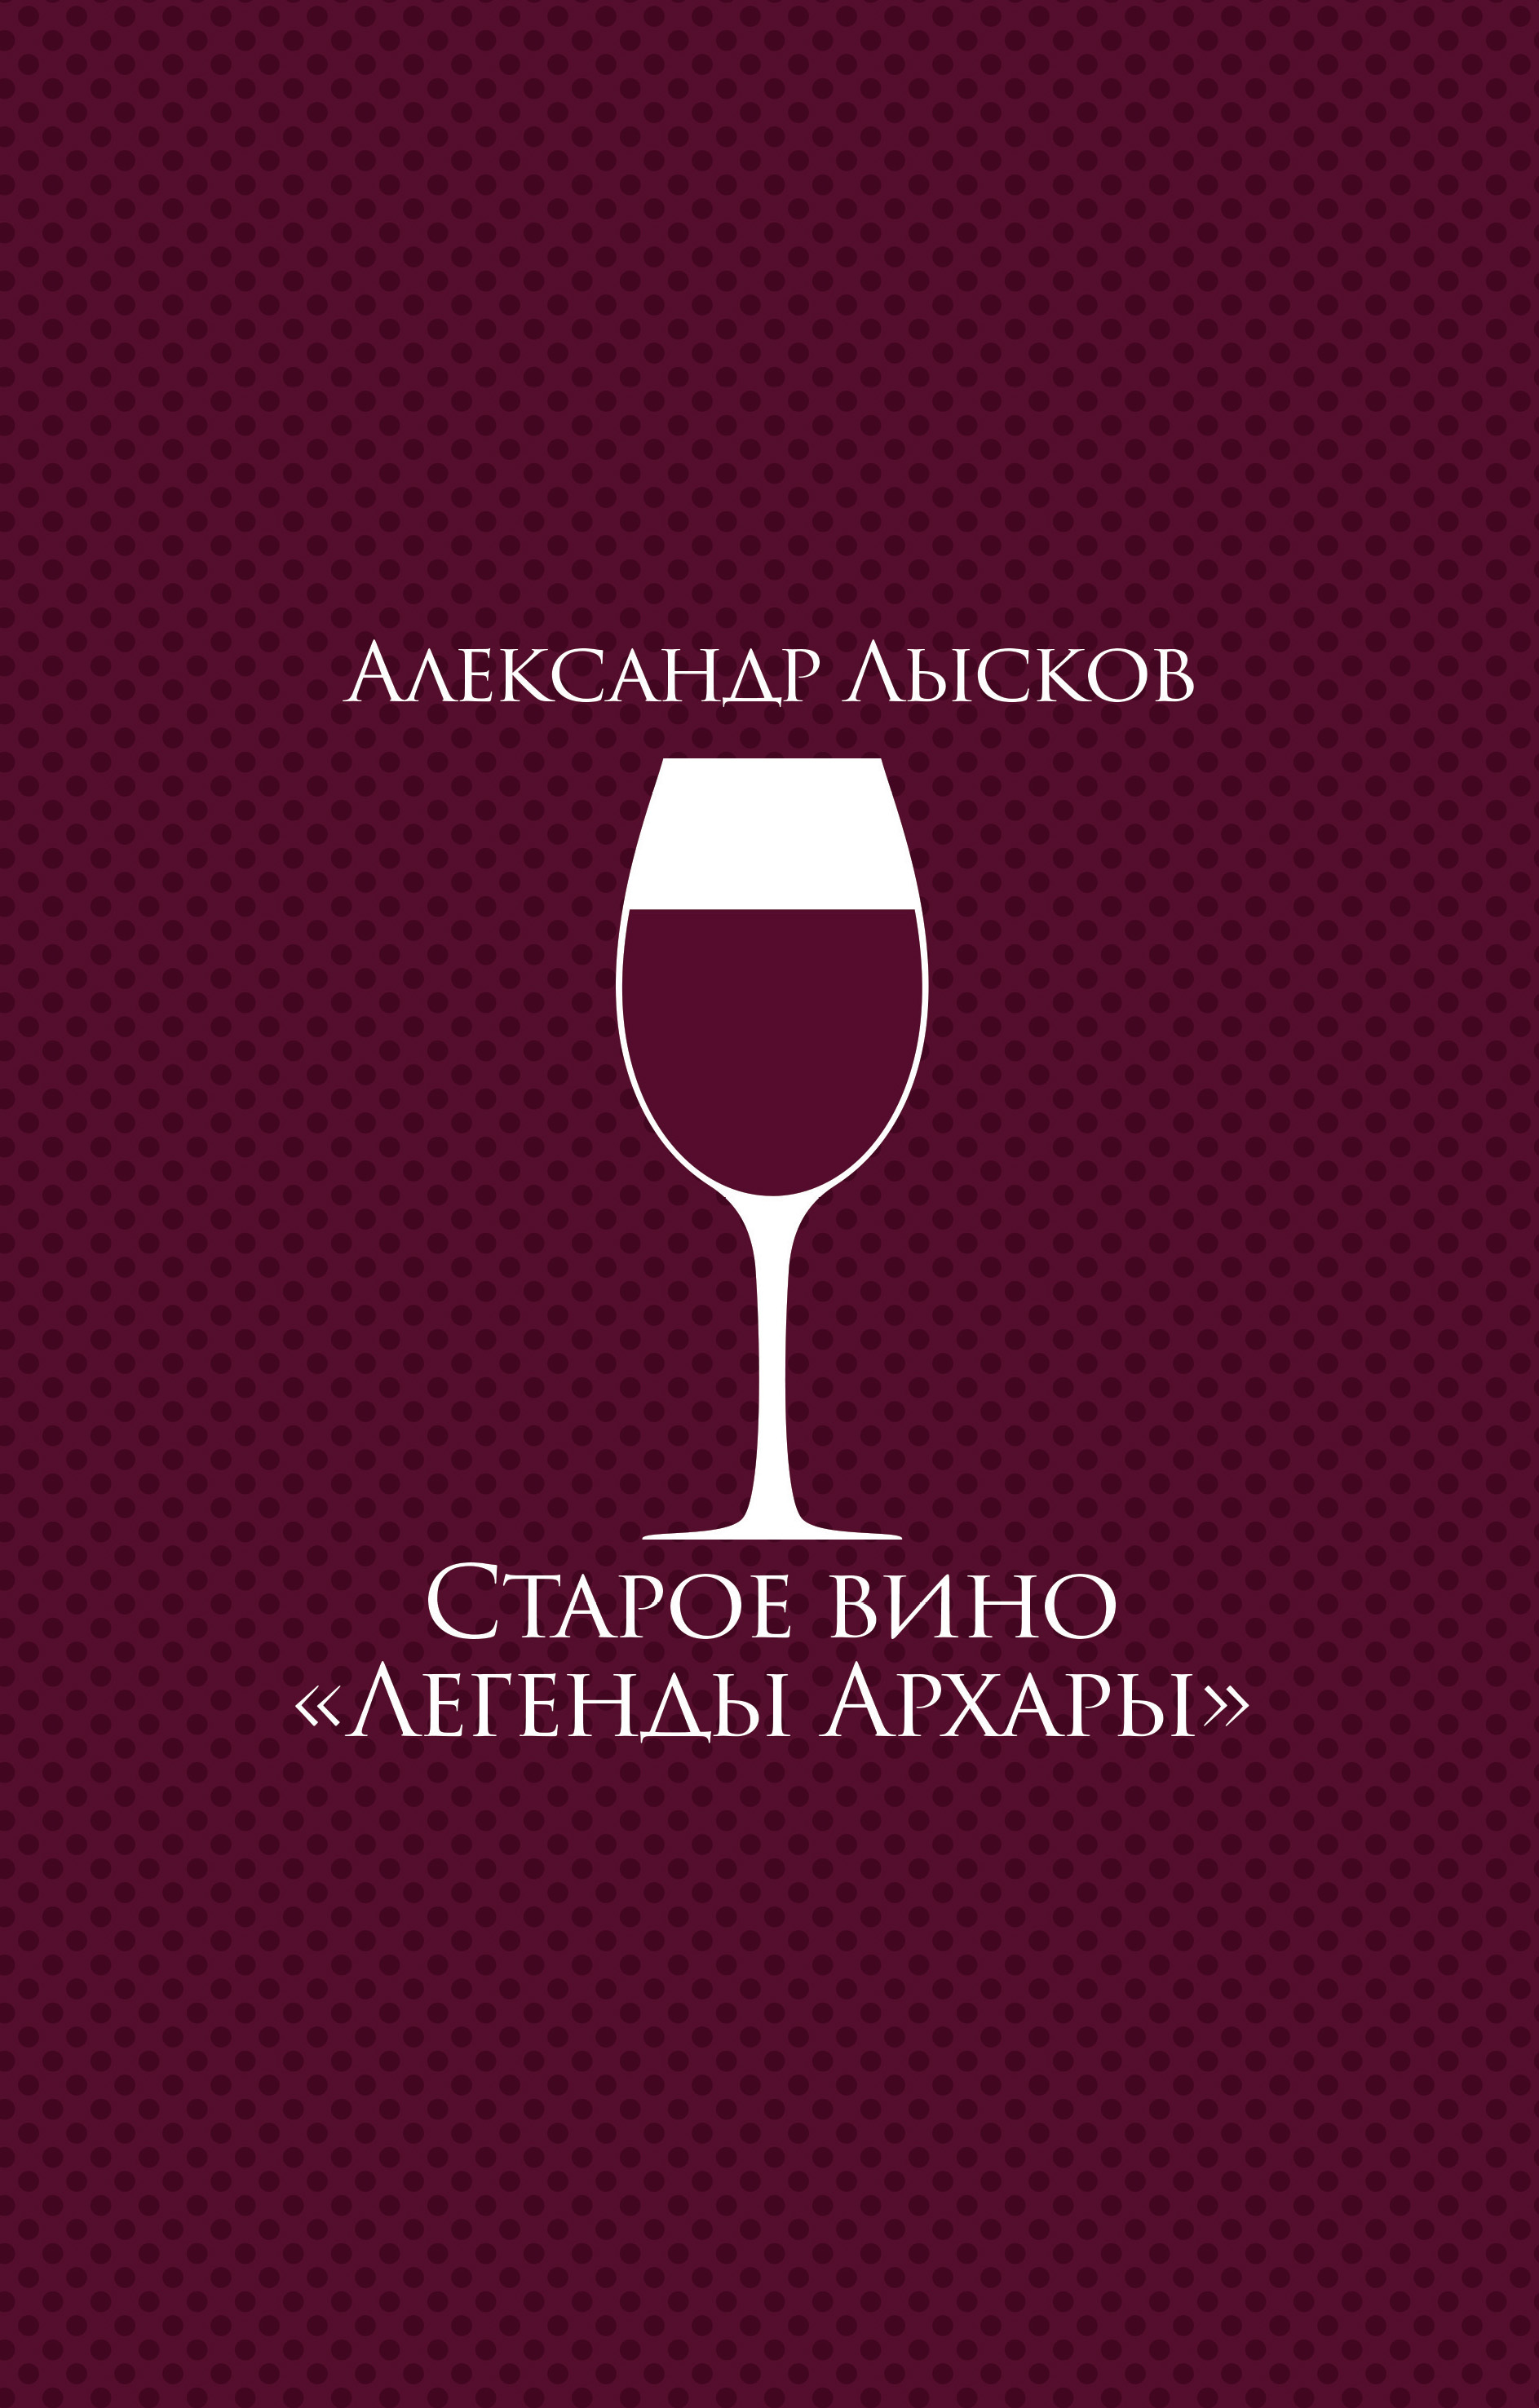 Старое вино «Легенды Архары» (сборник)